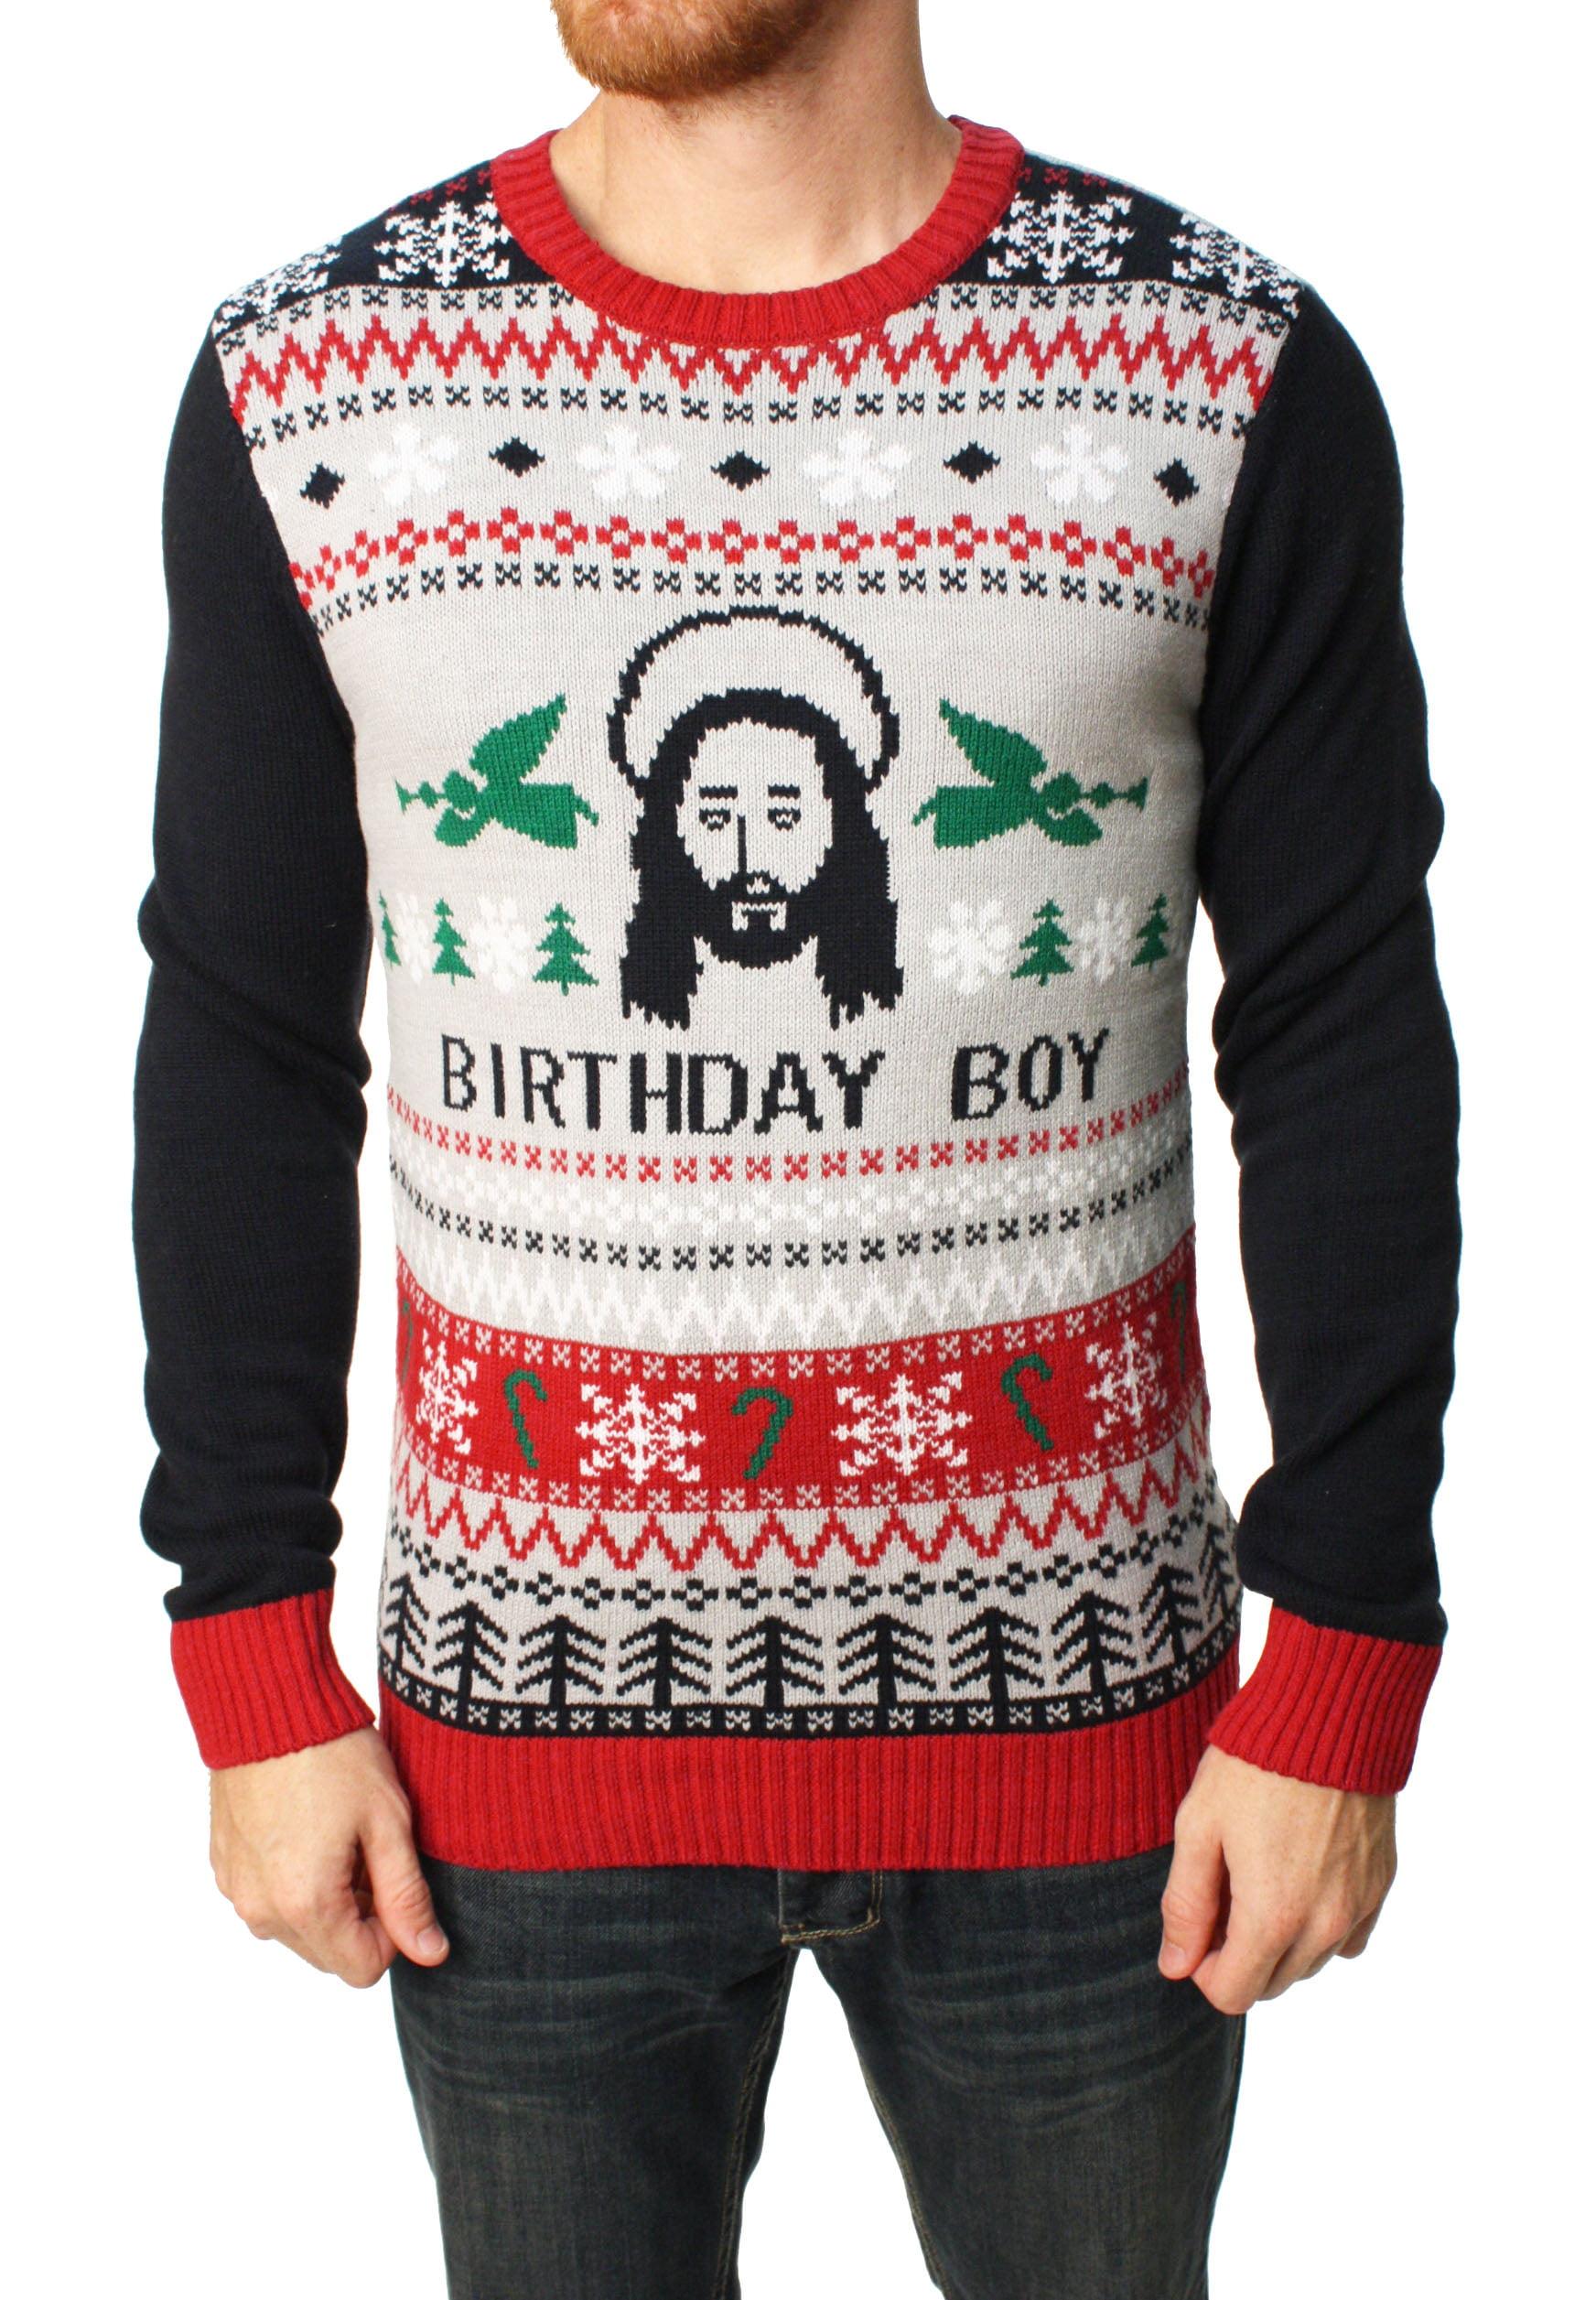 Ugly Christmas Sweater Ugly Christmas Sweater Men's Jesus Birthday Boy Pullover Sweater